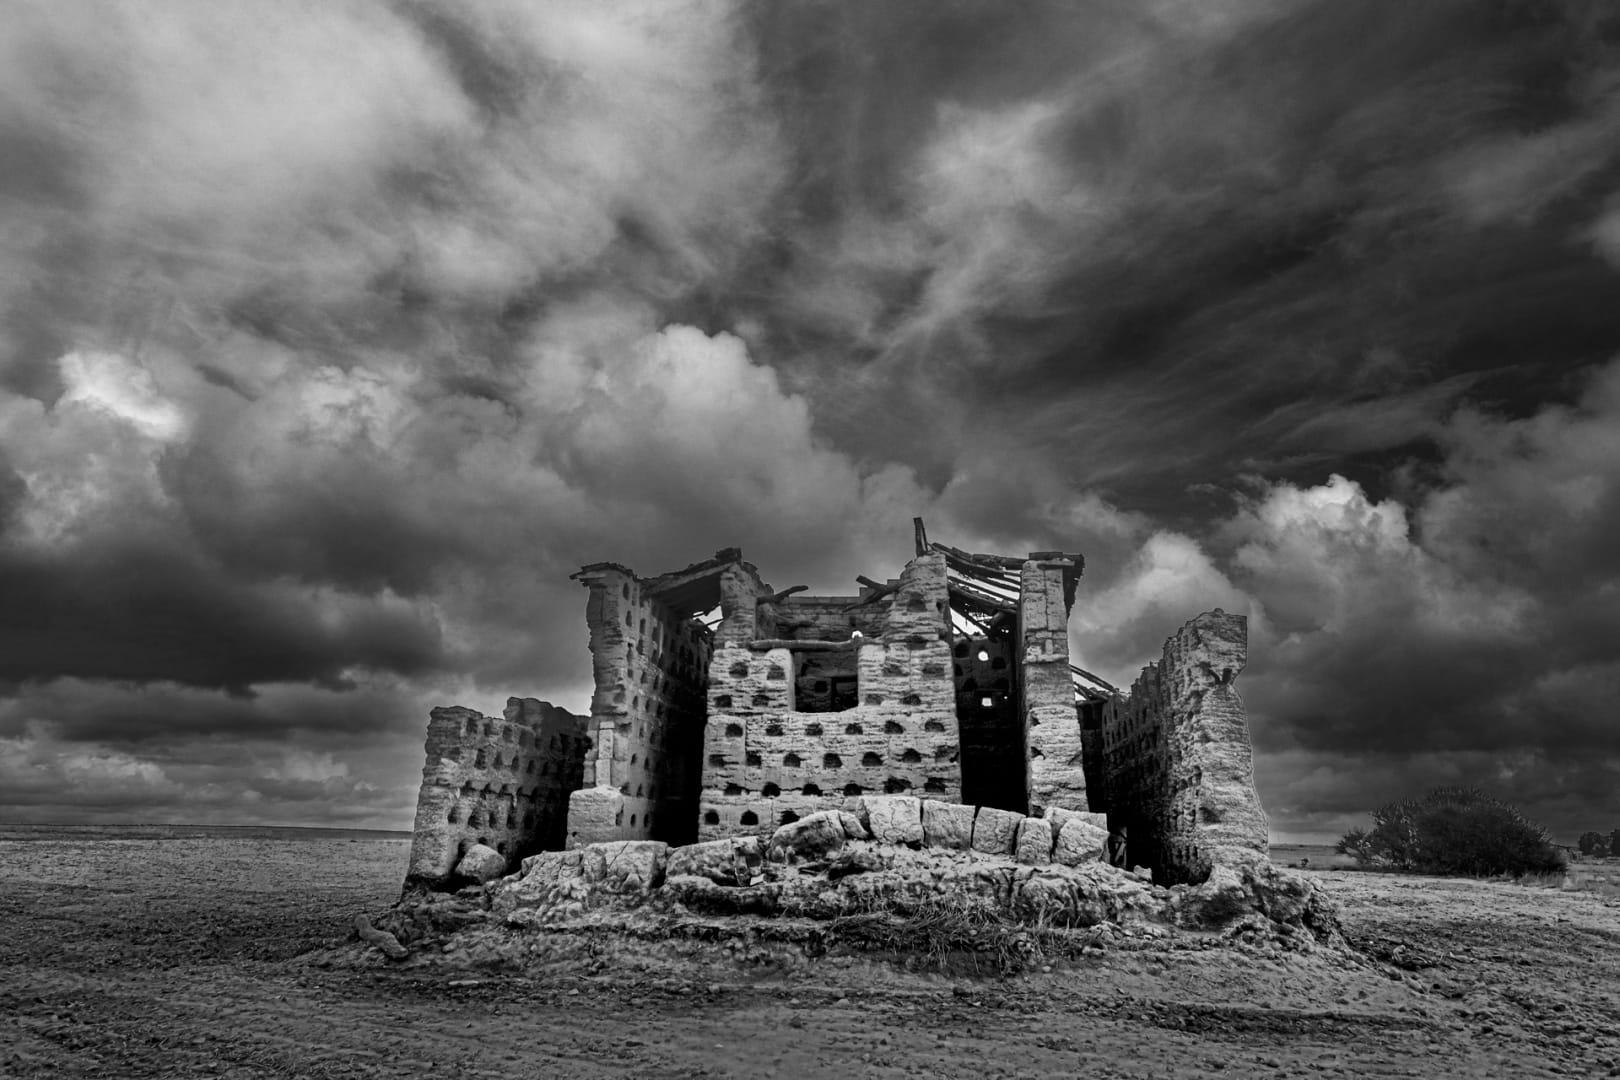 Palomar en ruinas